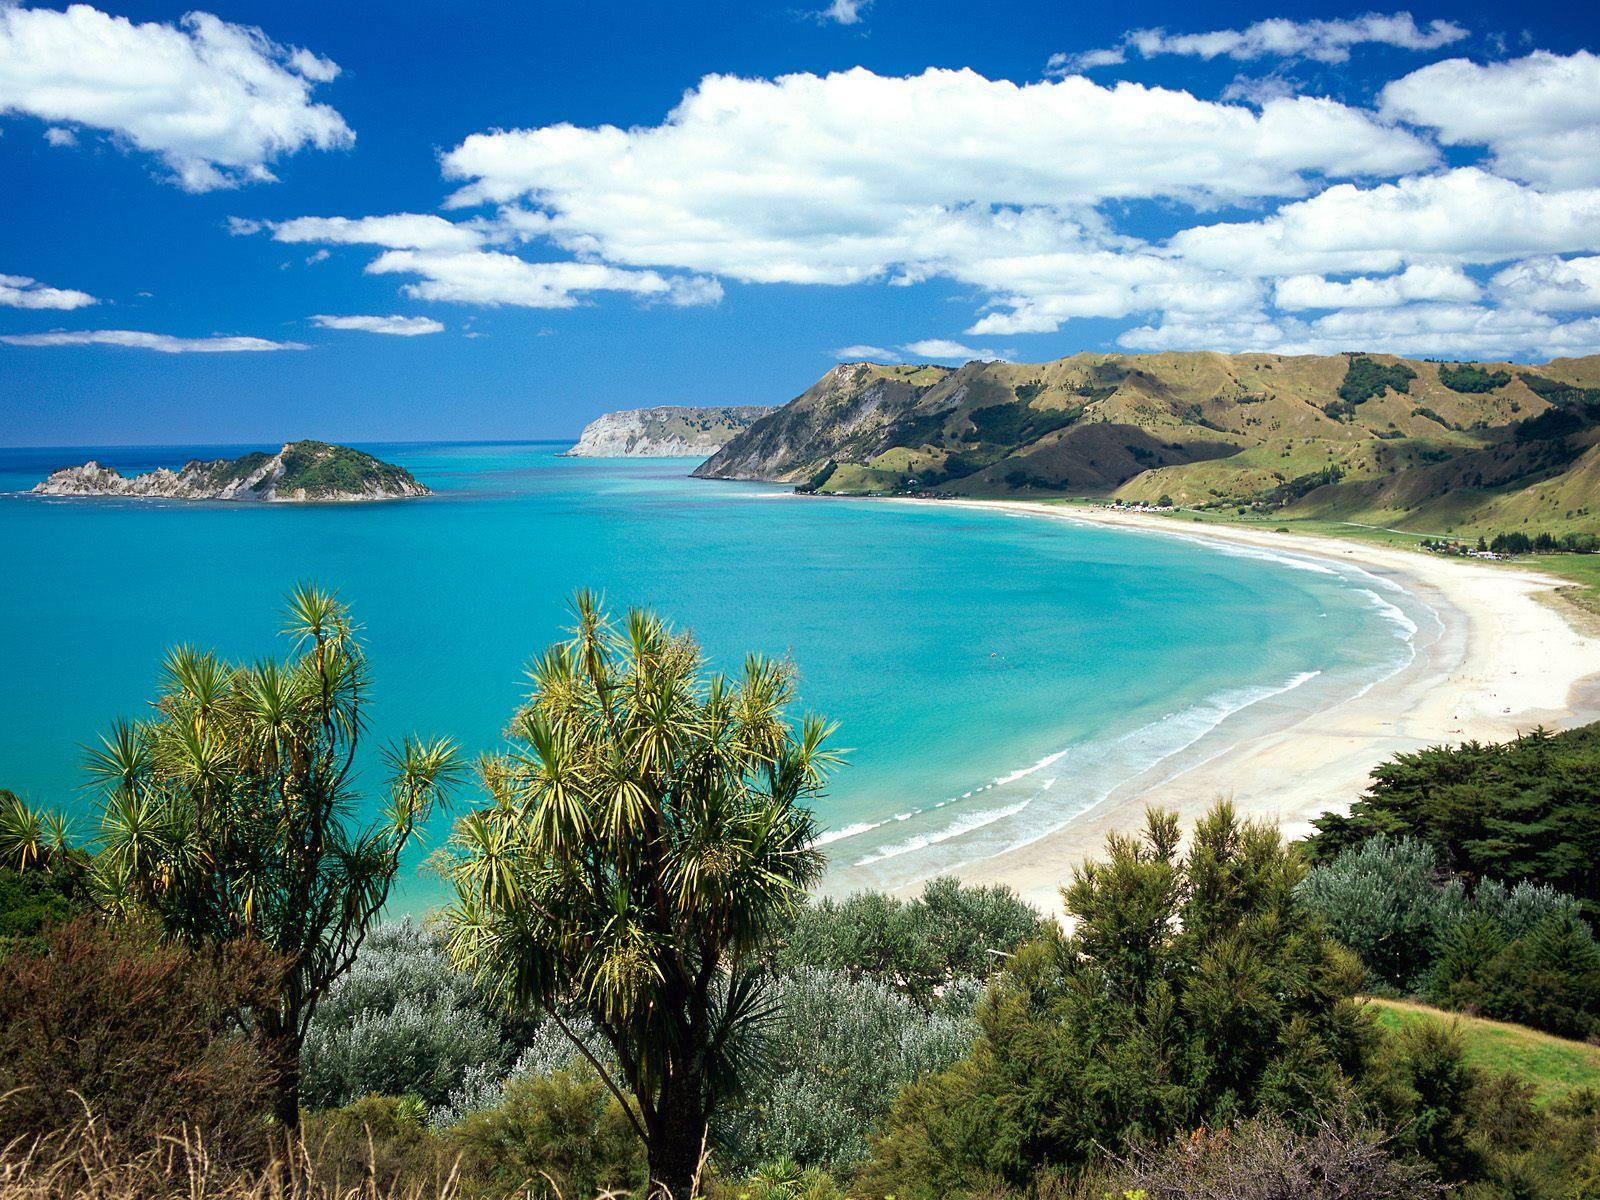 http://3.bp.blogspot.com/_e45GK4i1E8M/TRdke__0BjI/AAAAAAAACYs/aCnIy7vyXys/s1600/Anaura_Bay_Gisborne_New_Zealand.jpg